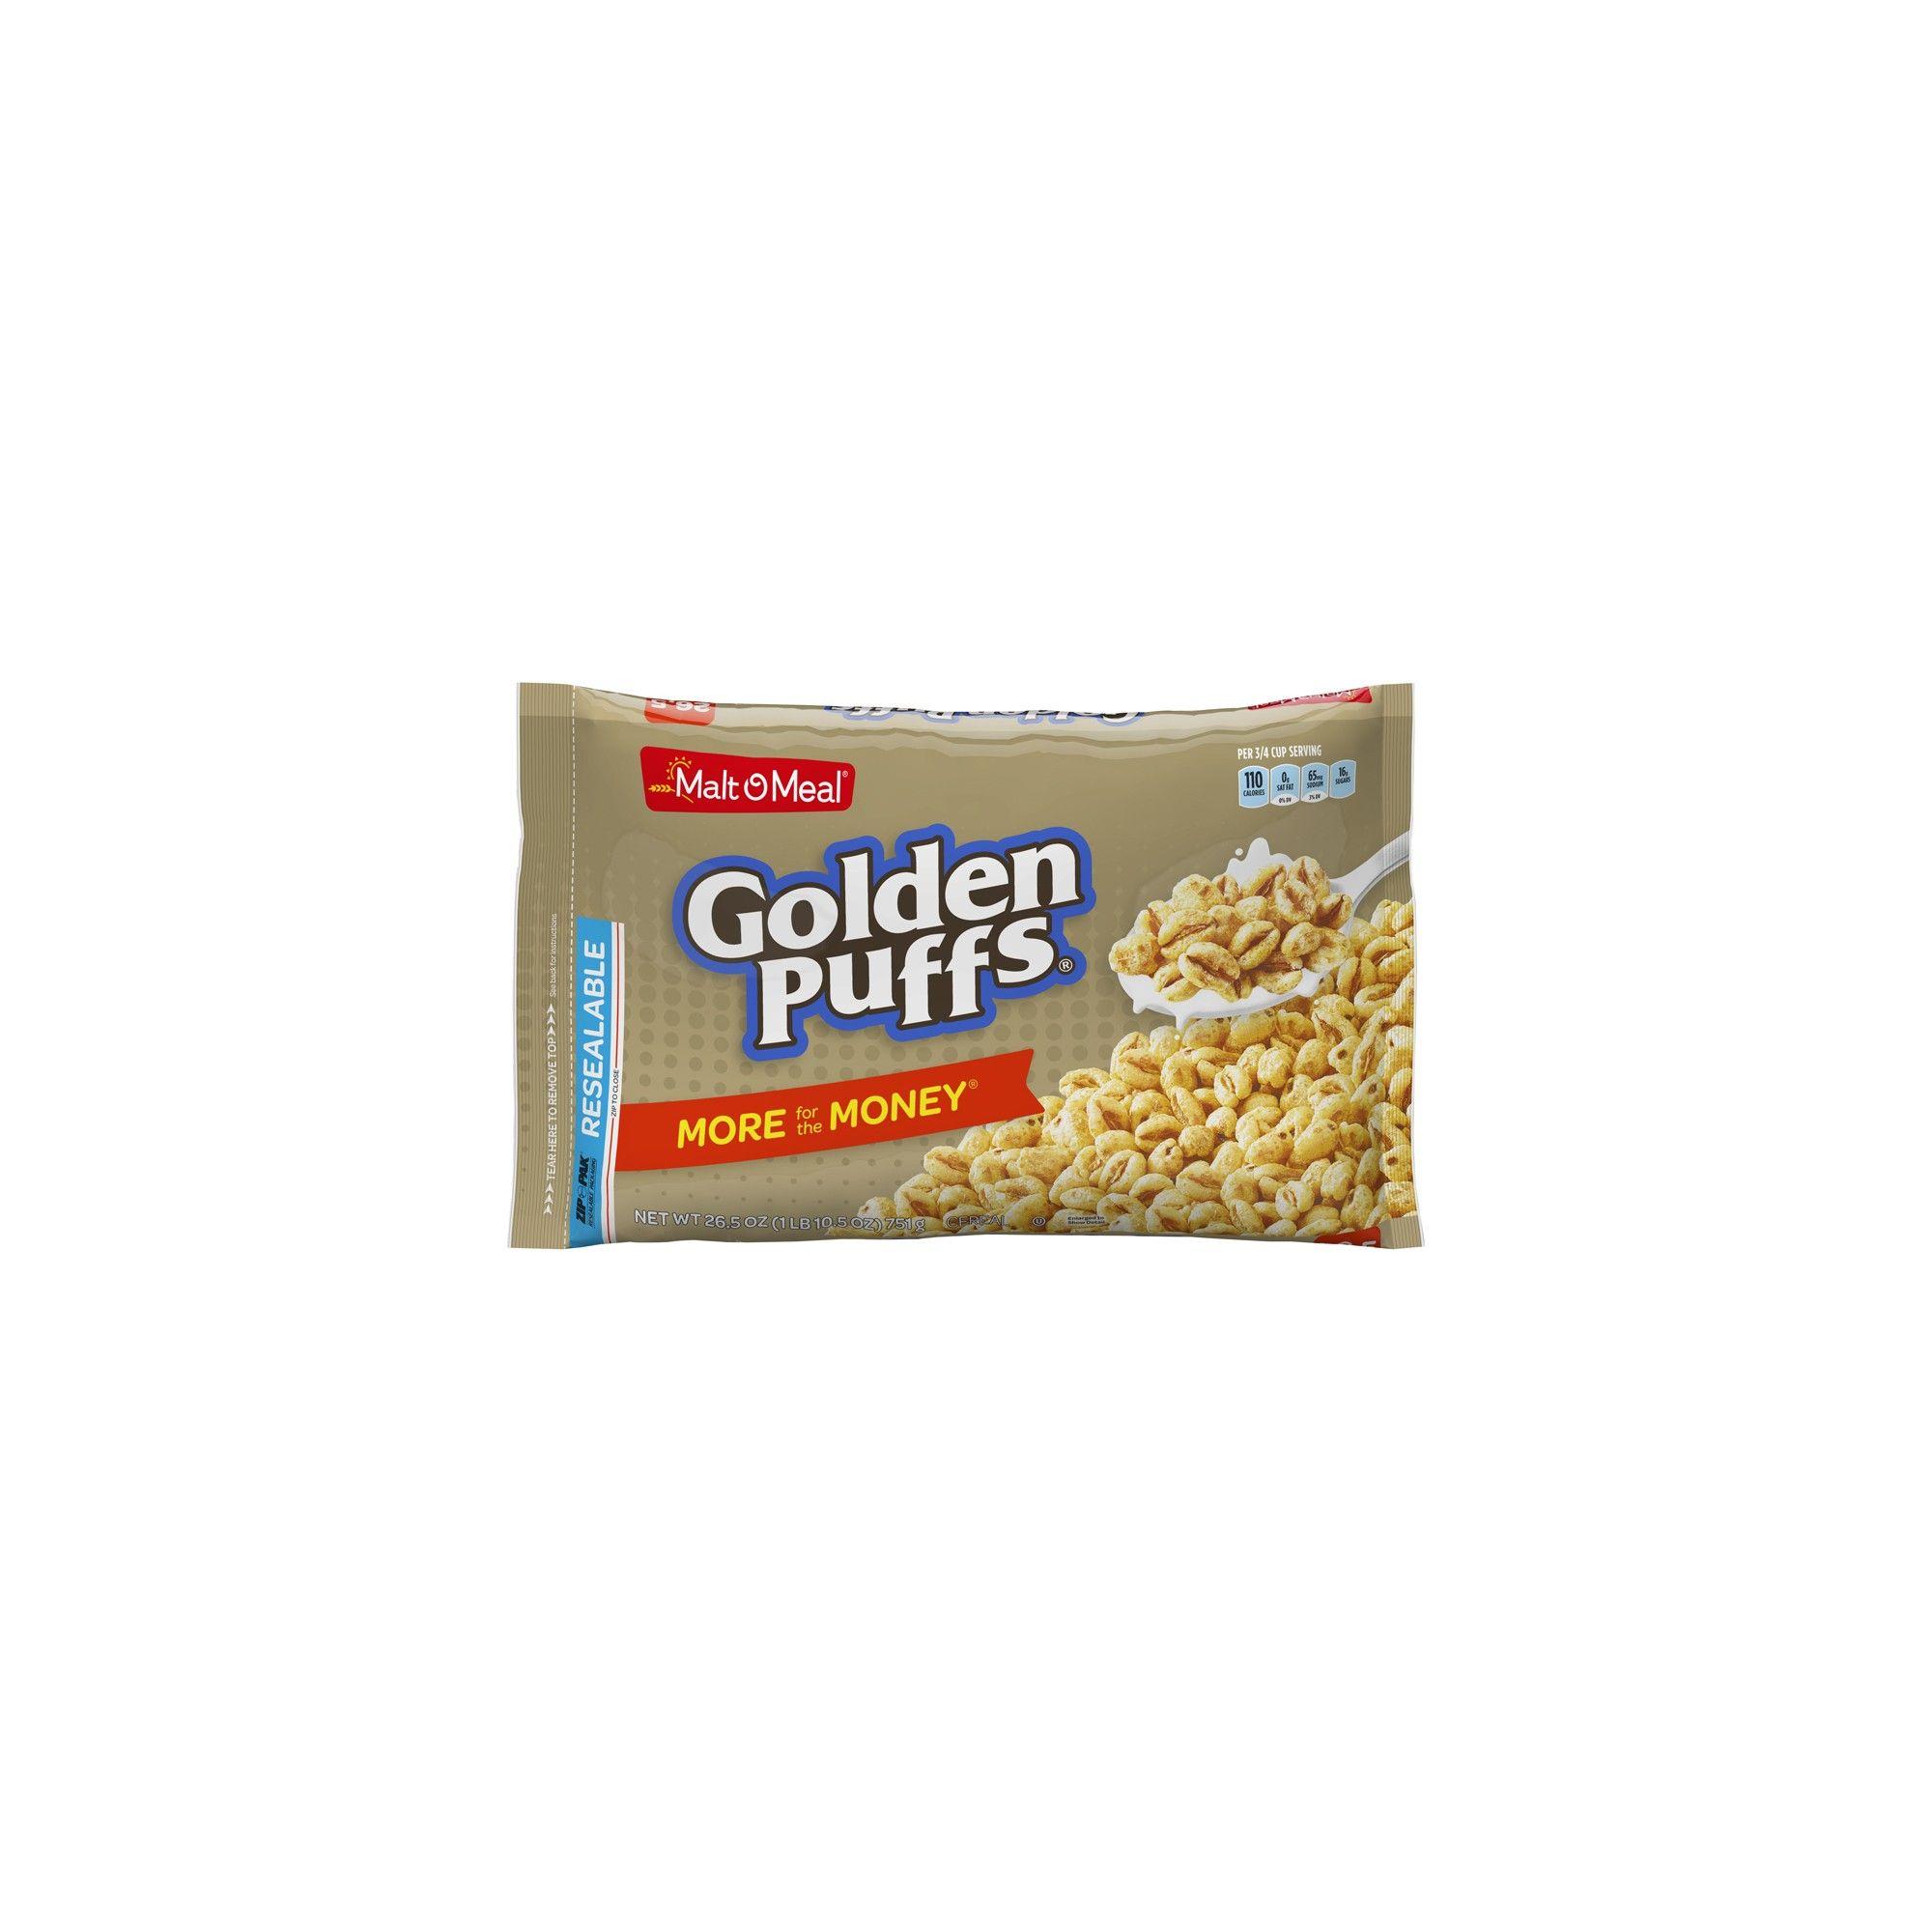 Golden Puffs Breakfast Cereal